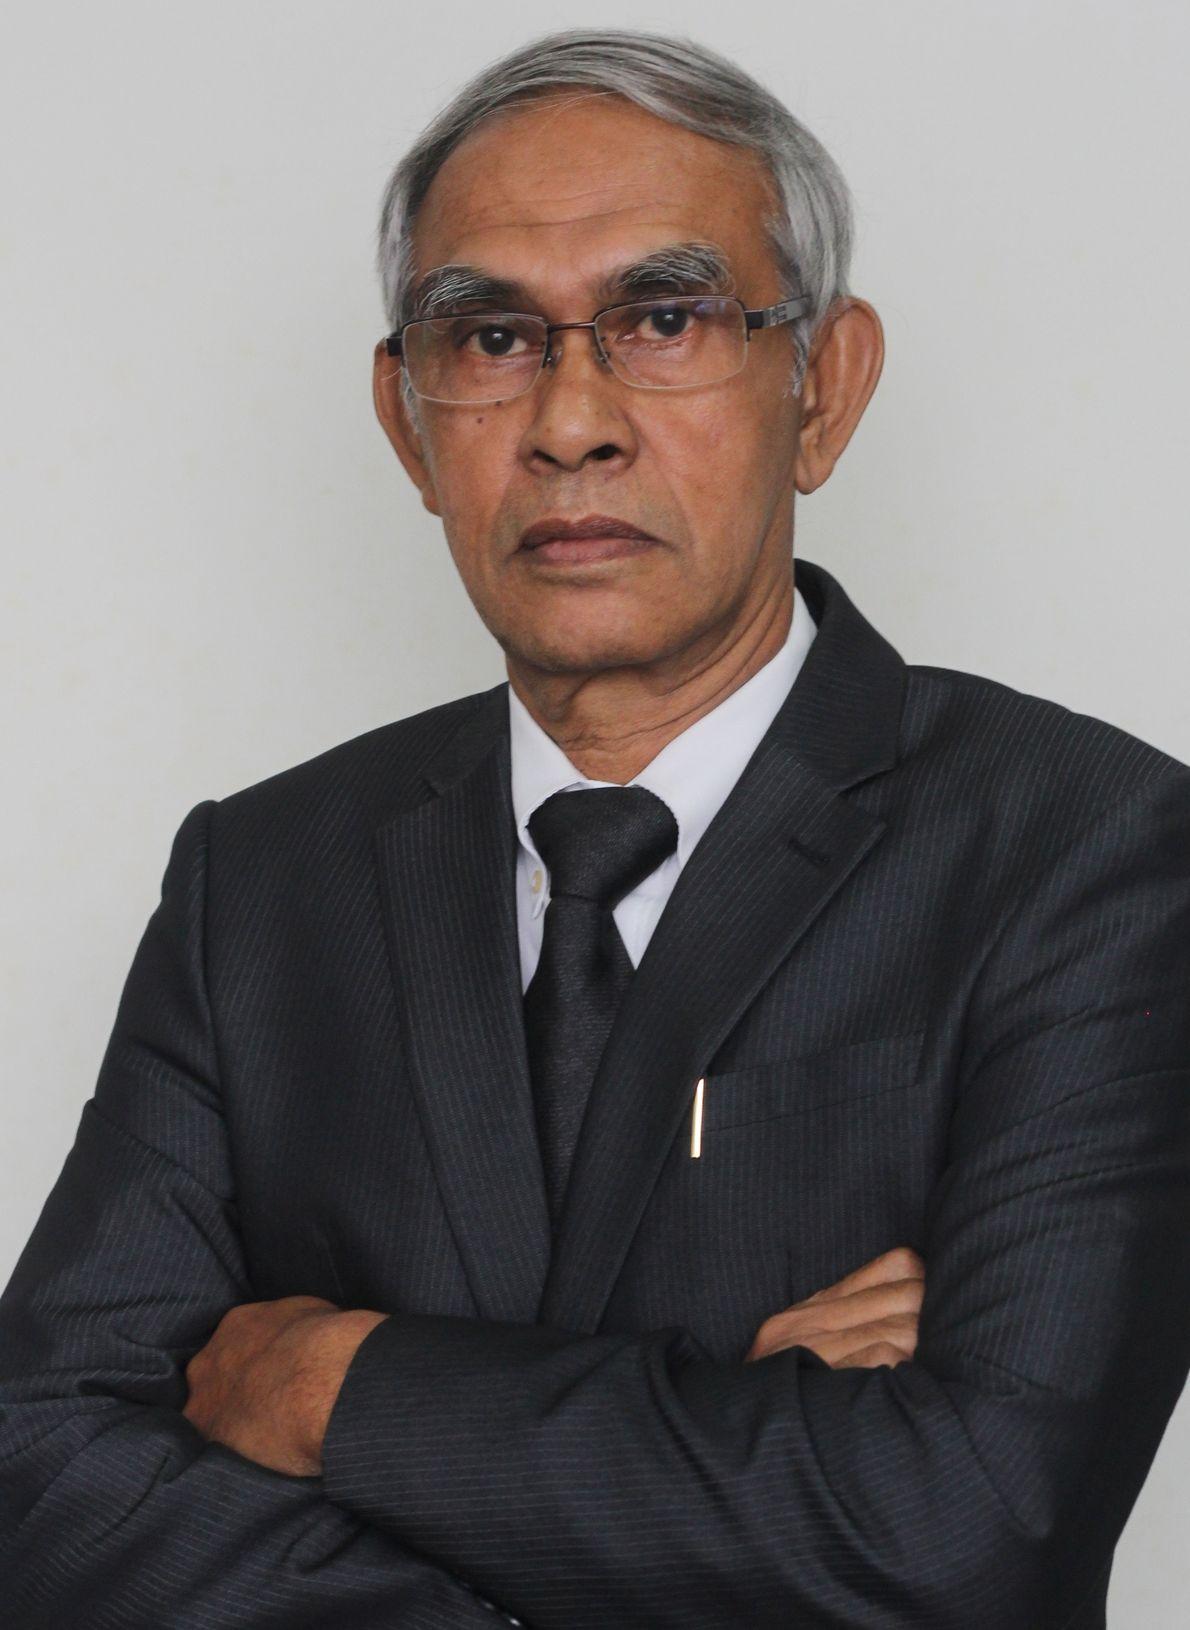 Dato' Haji Mohd Nor Ramli